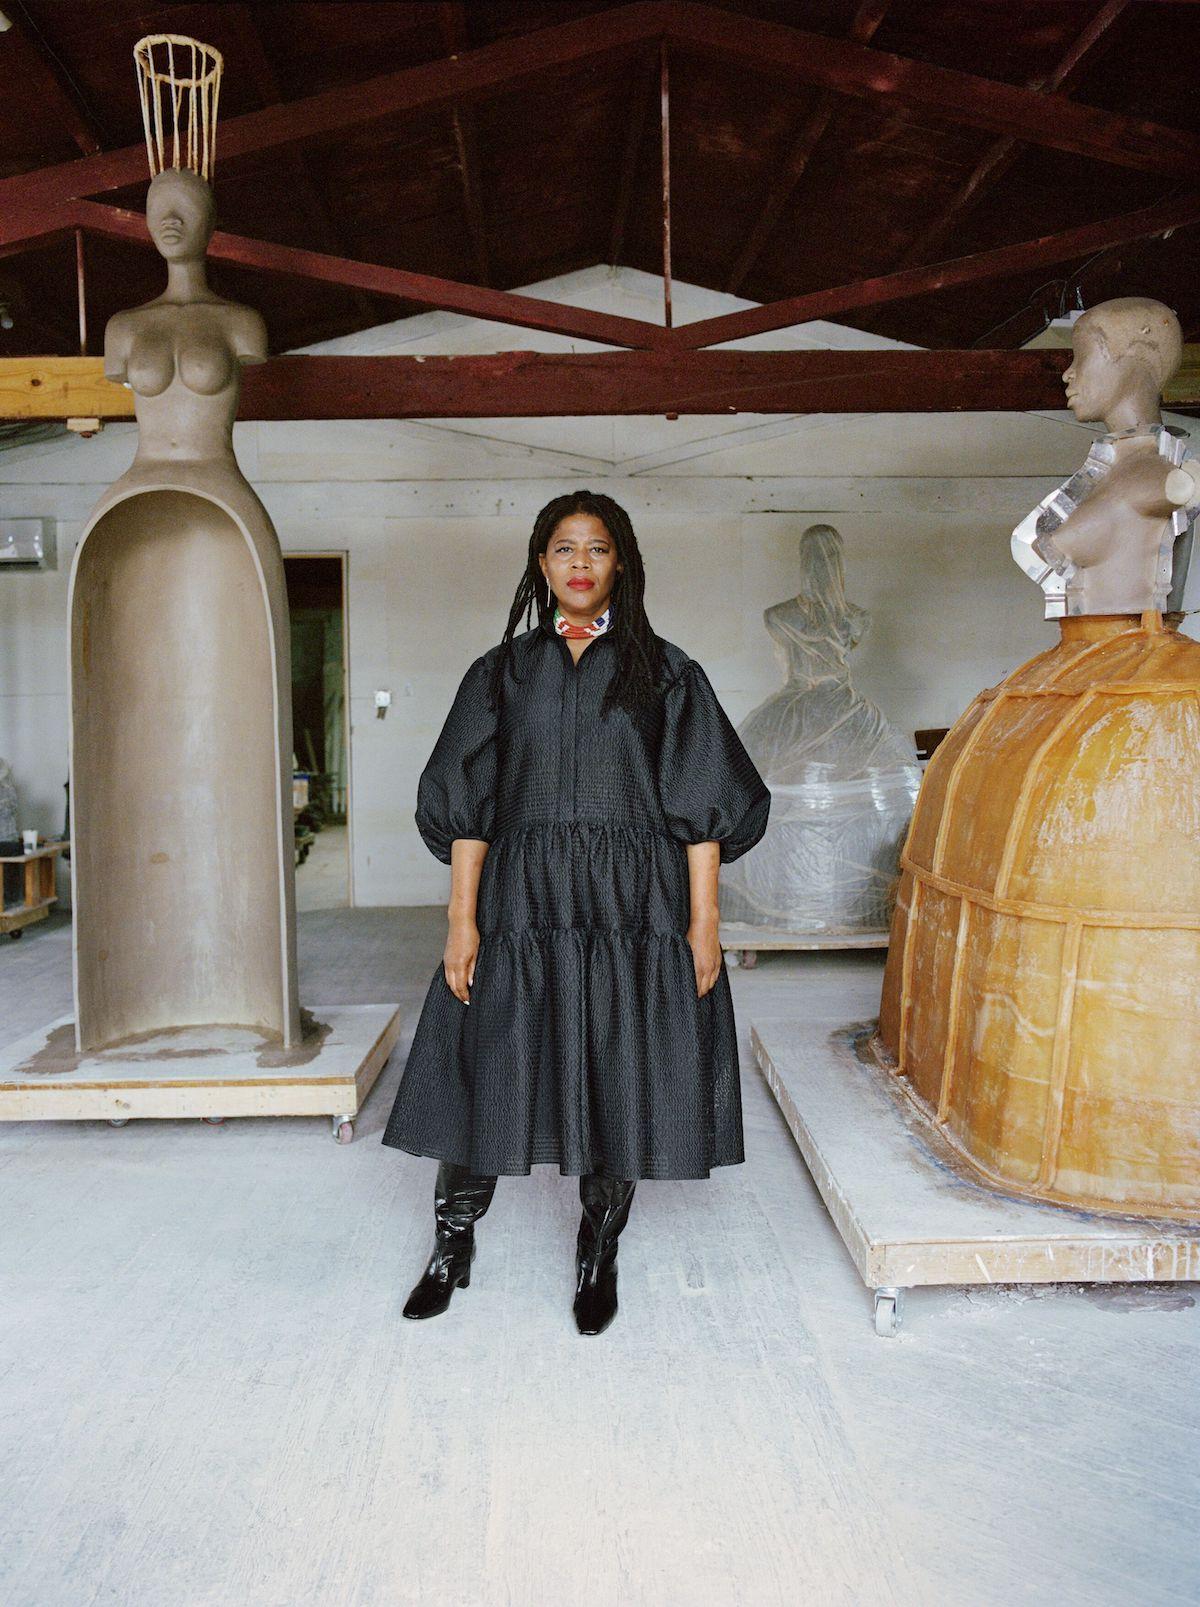 Simone Leigh Portrait standing in her Studio amid sculptures